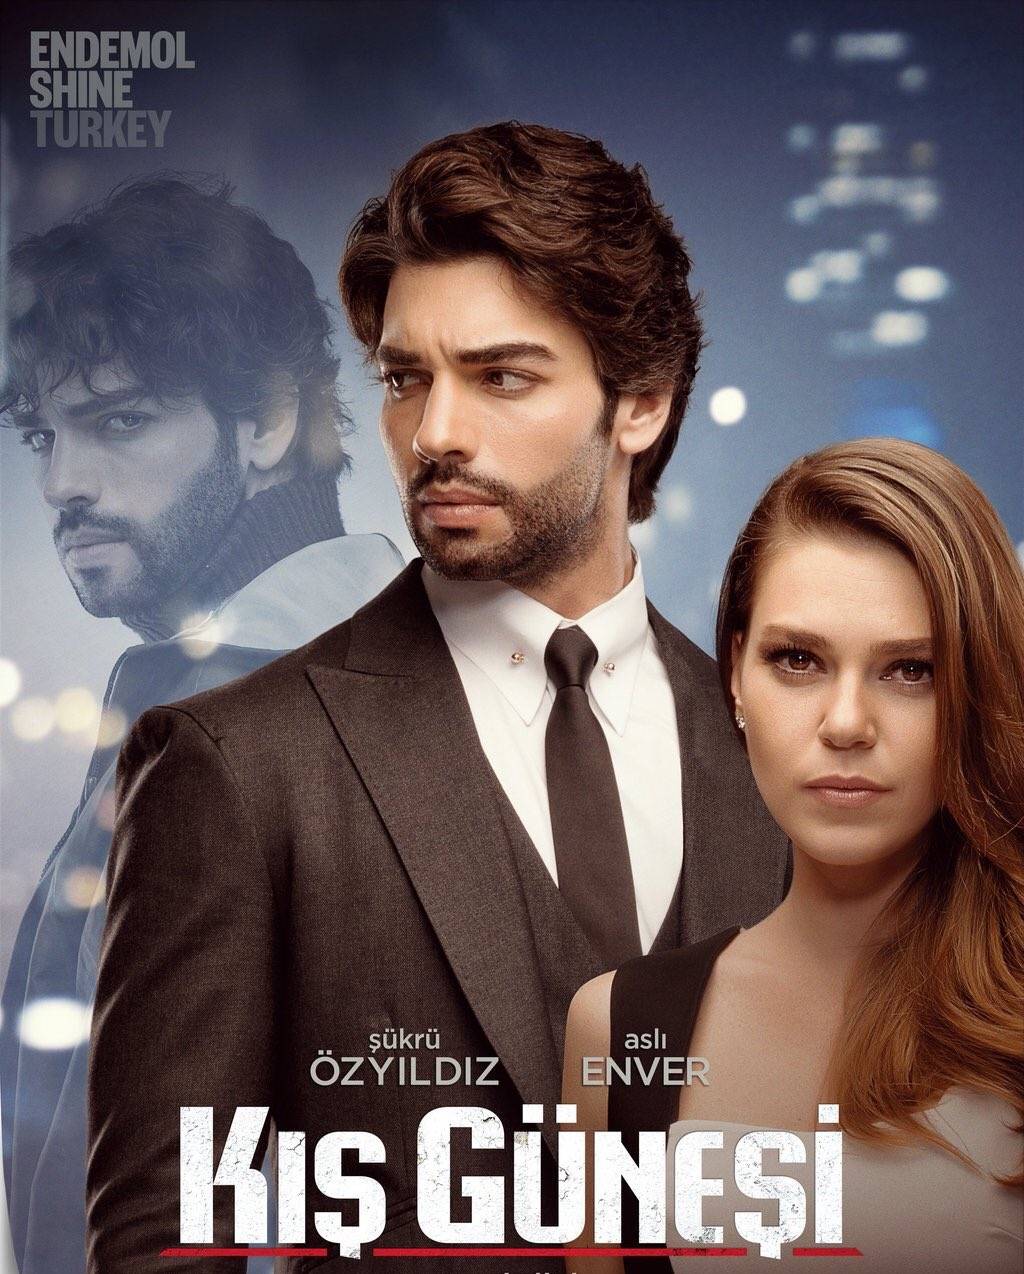 identidad oculta novela turca